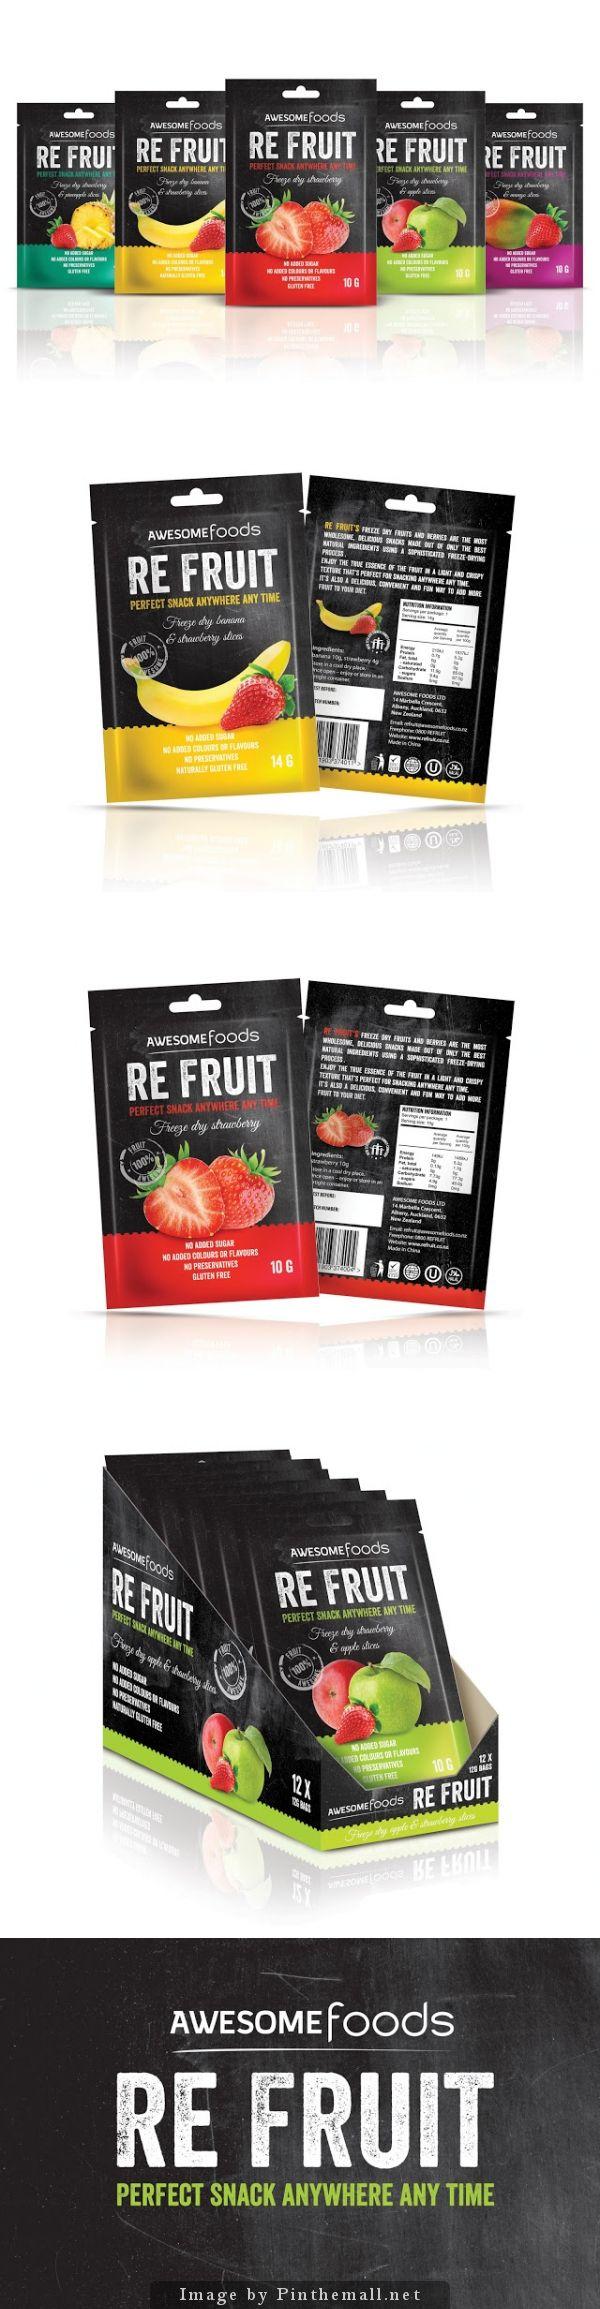 RE #FRUIT, Designer: Marcin Regucki - on Packaging of the World